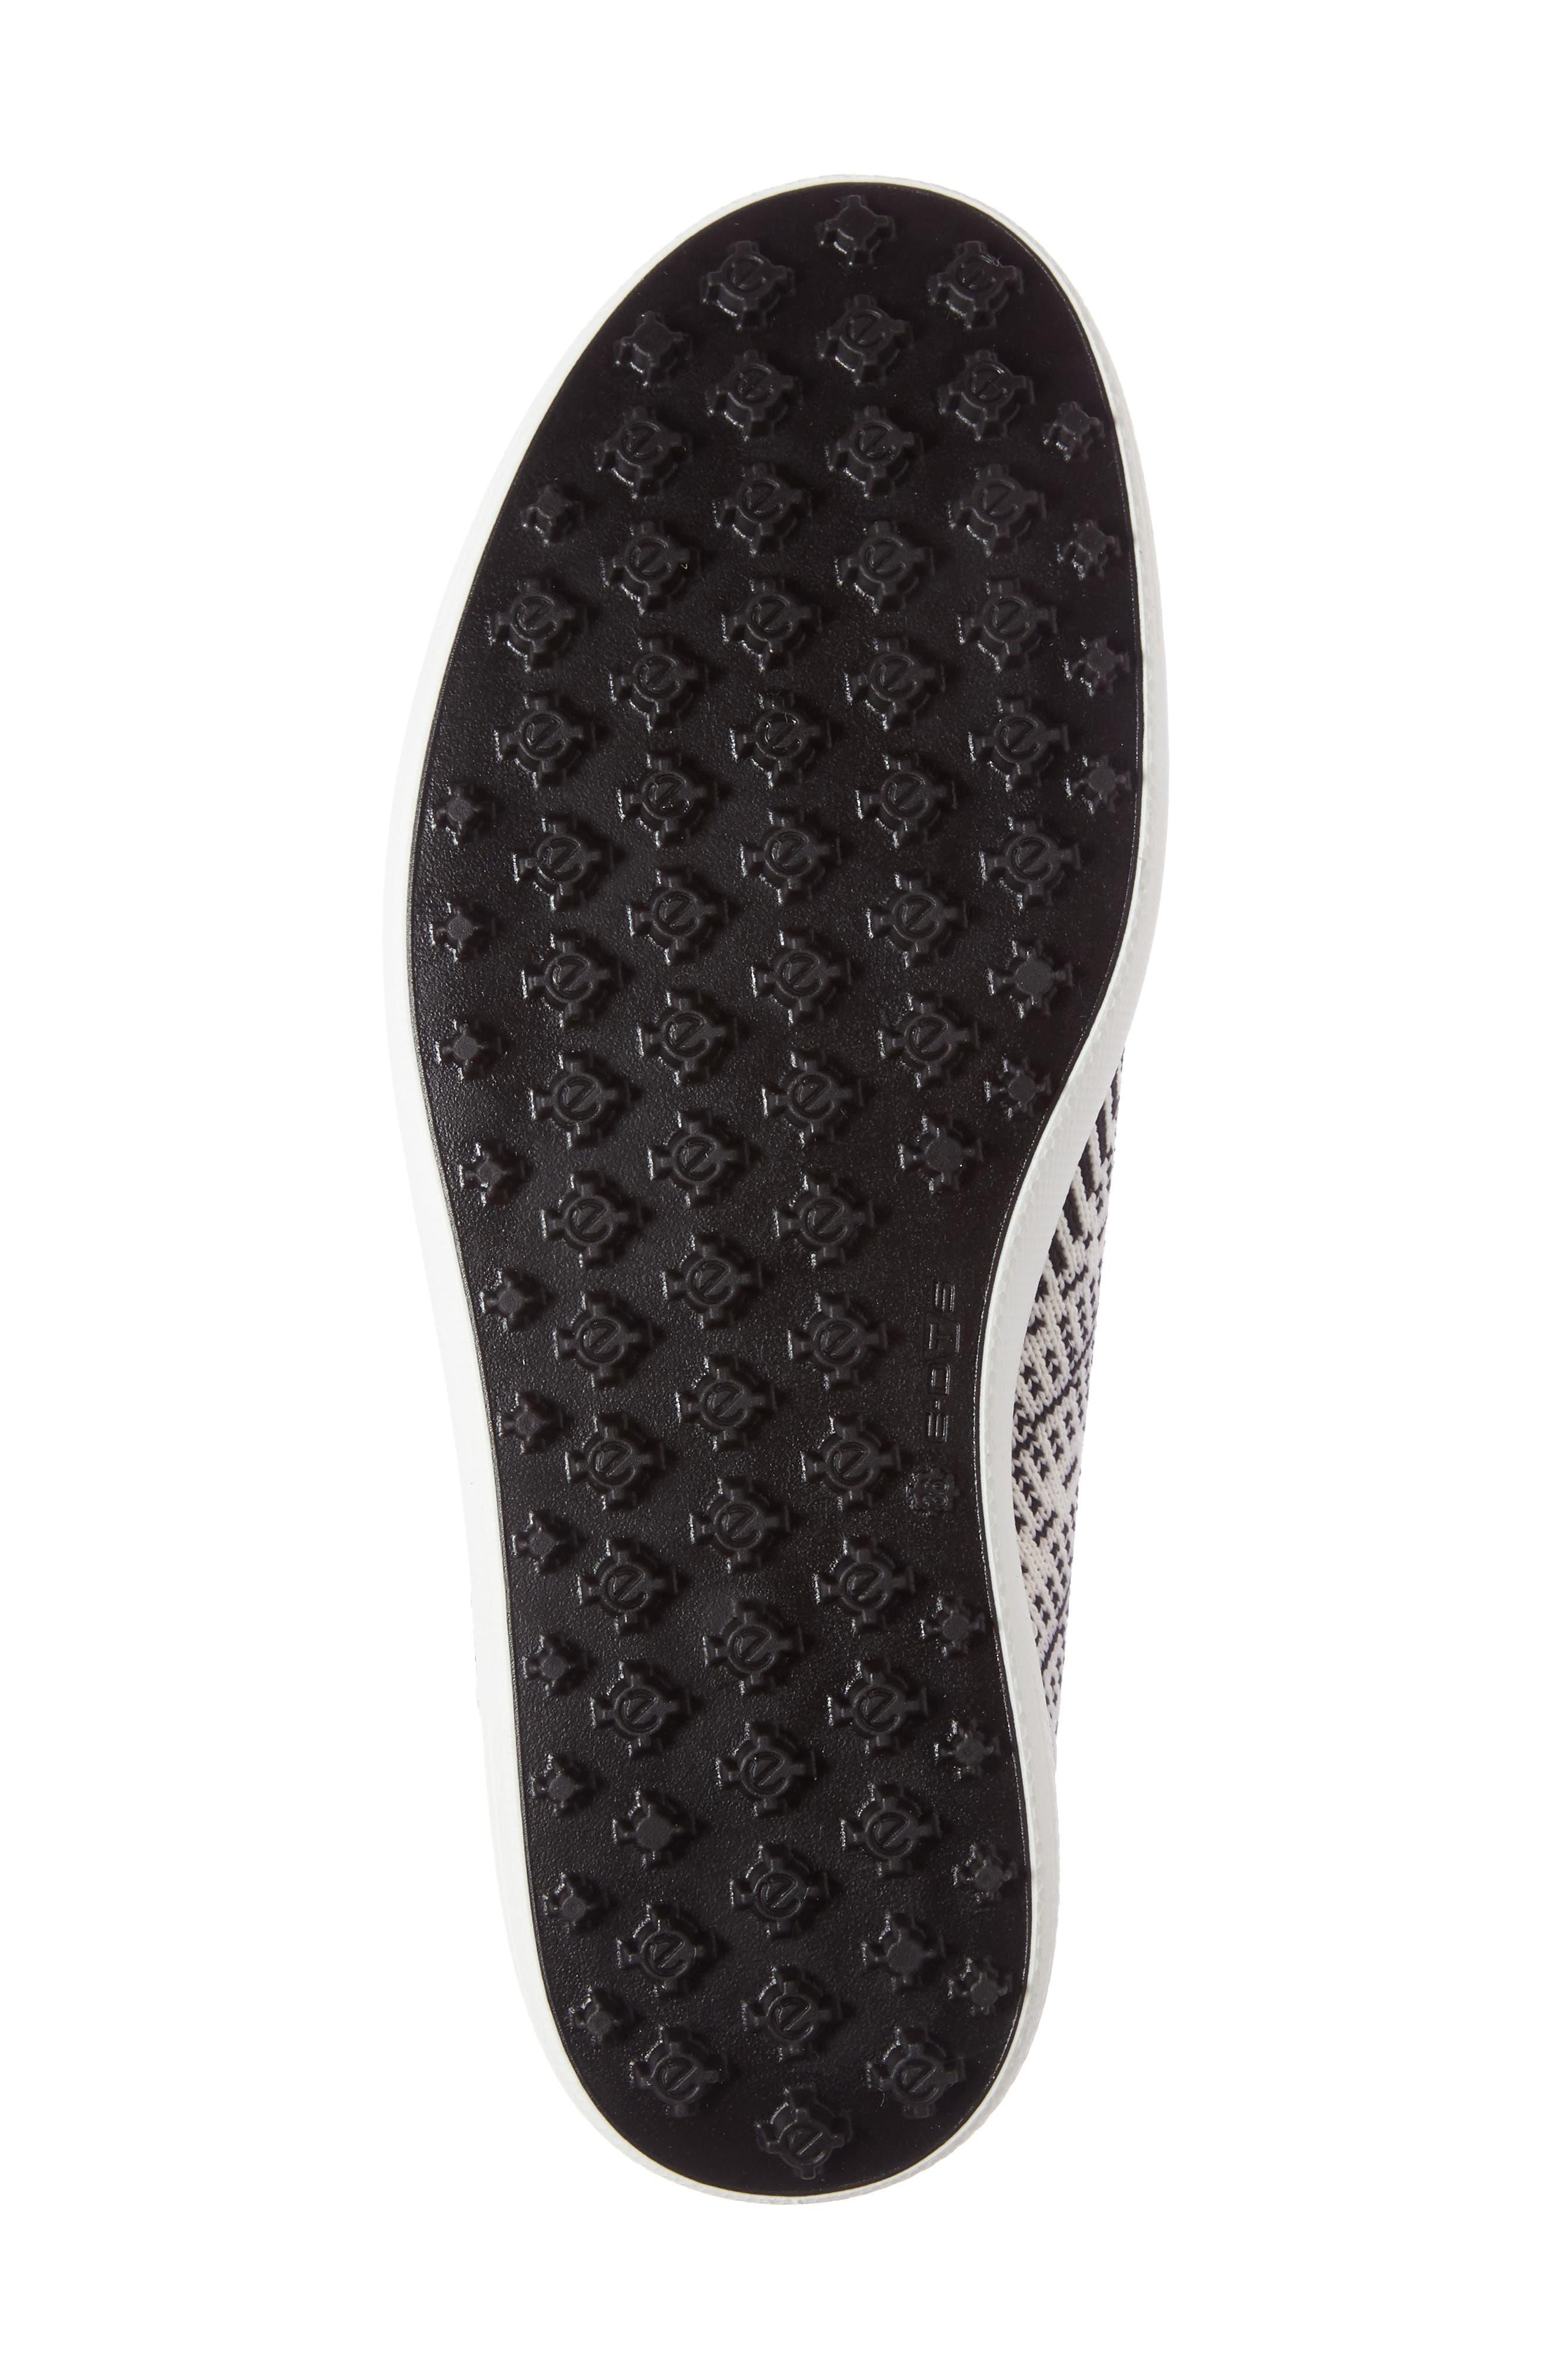 Casual Hybrid Knit Golf Sneaker,                             Alternate thumbnail 4, color,                             White/ Black/ White Leather